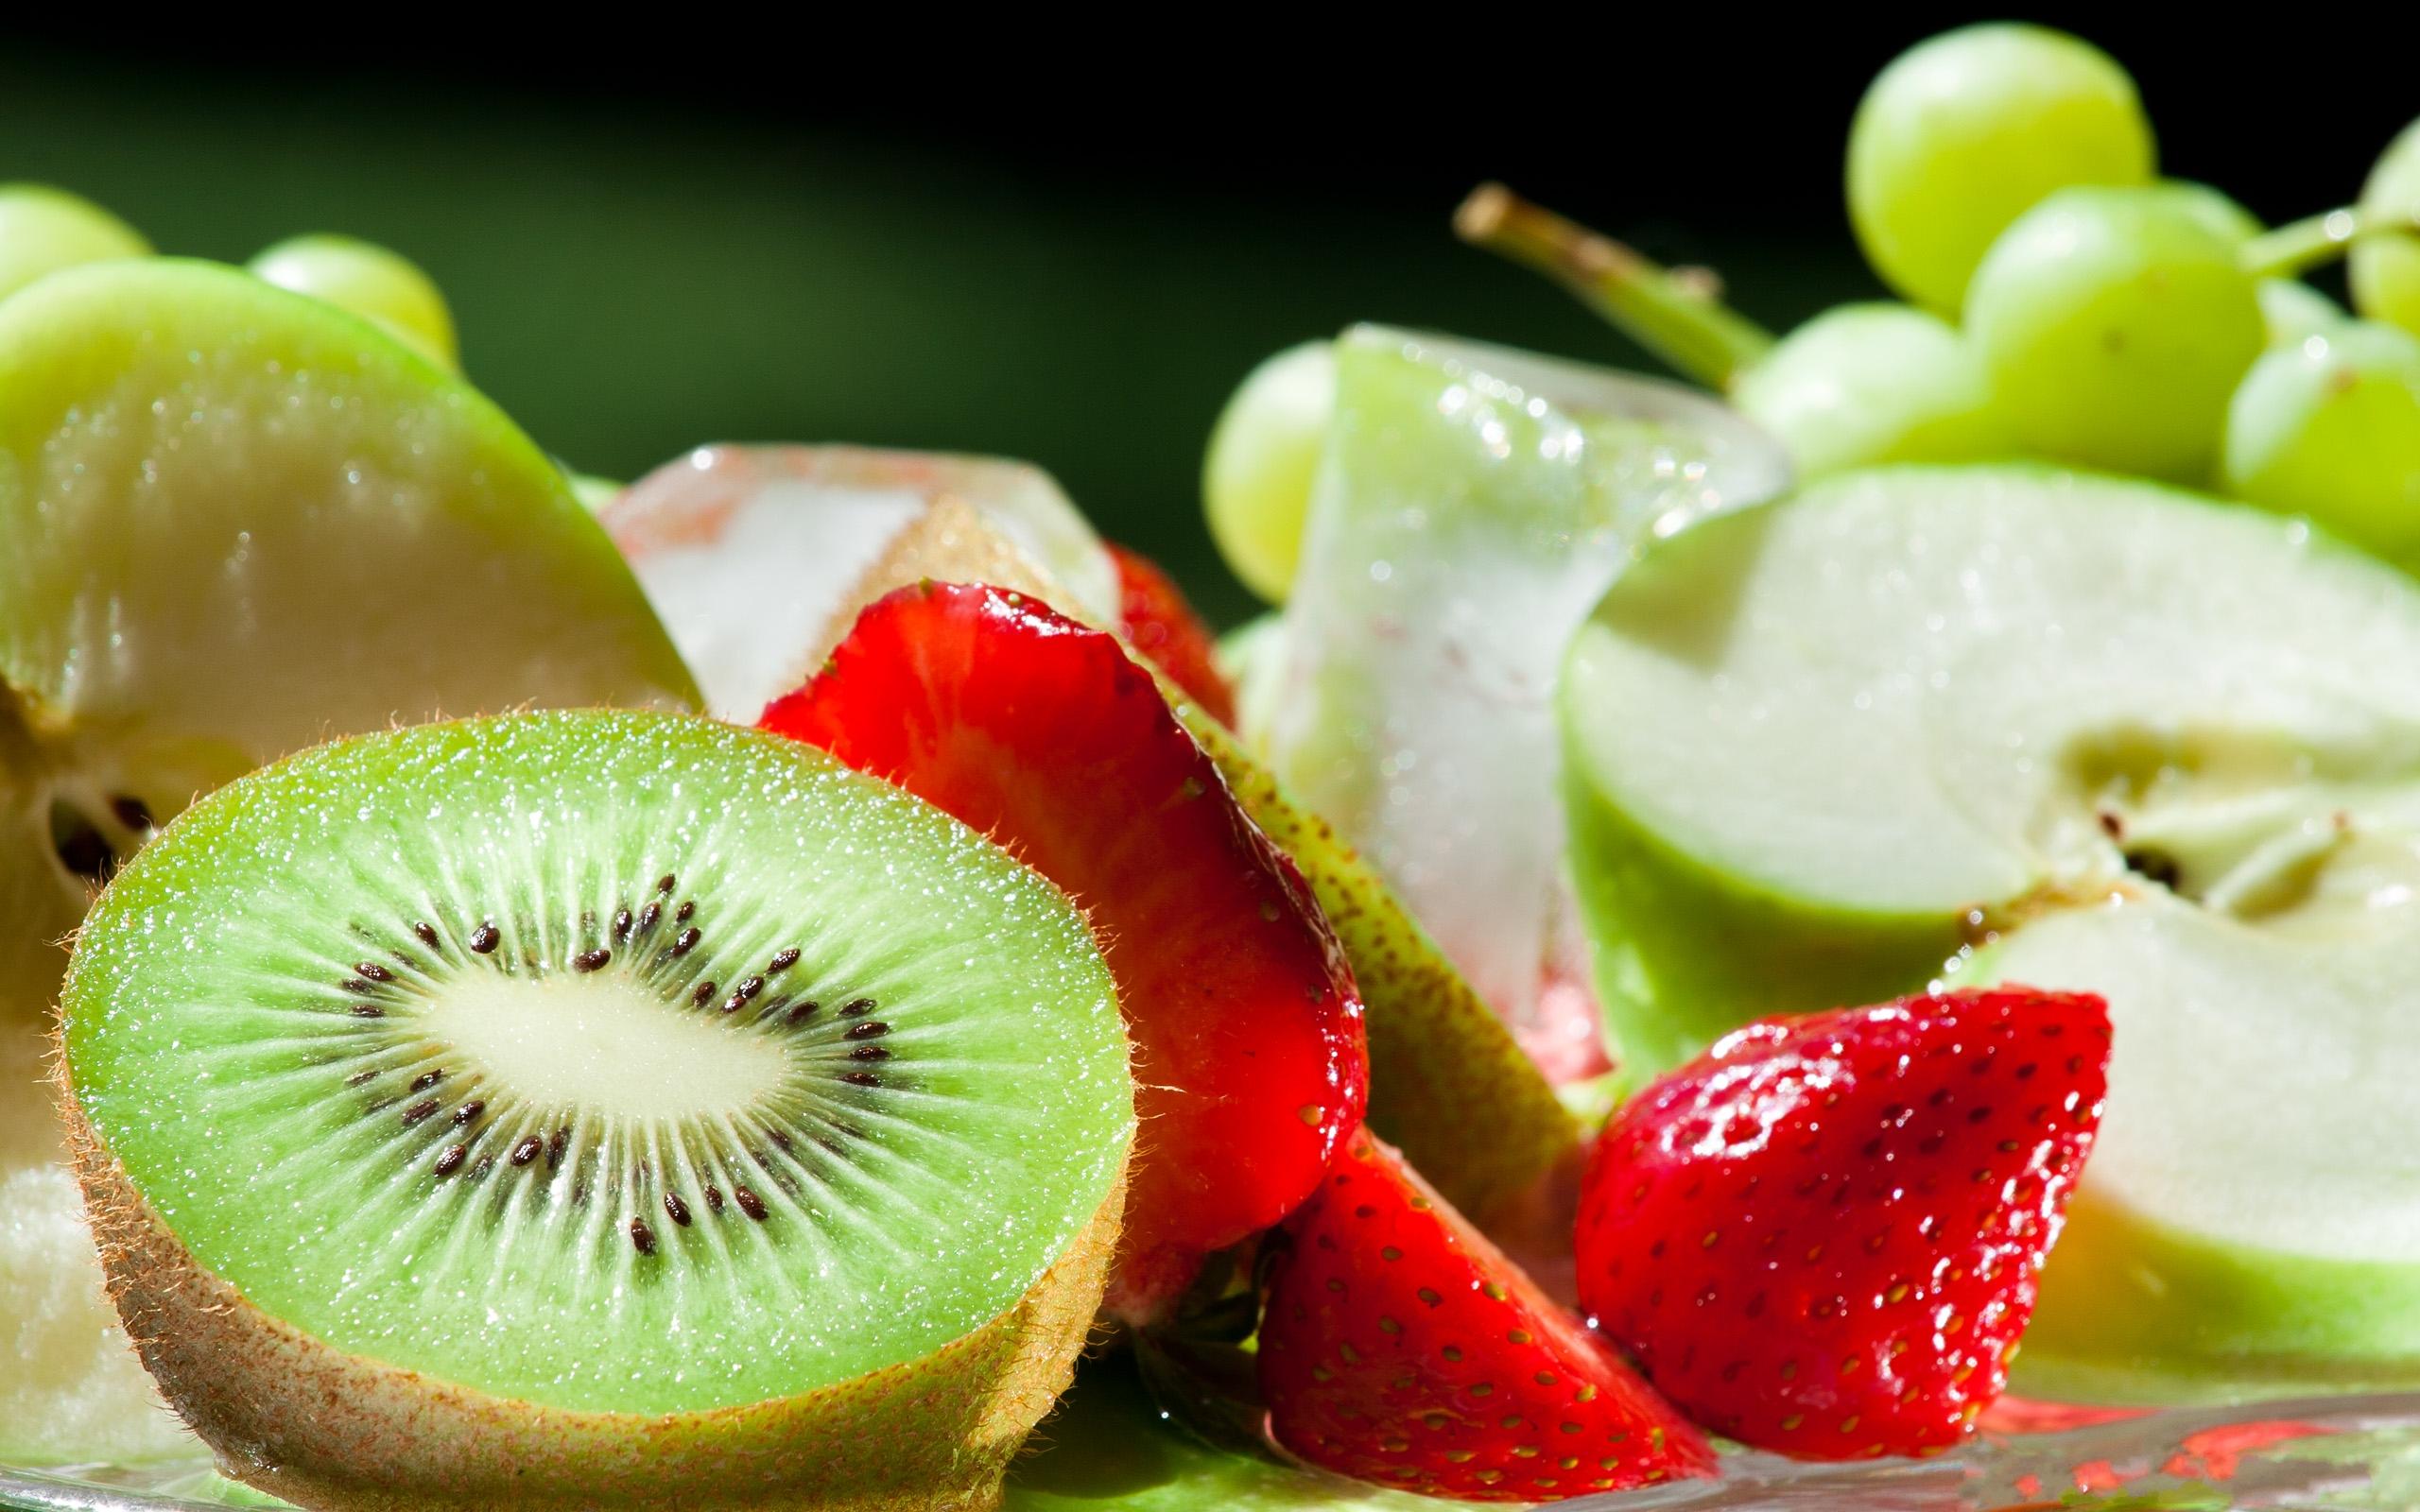 kiwi-jablka-truskawki-winogrona